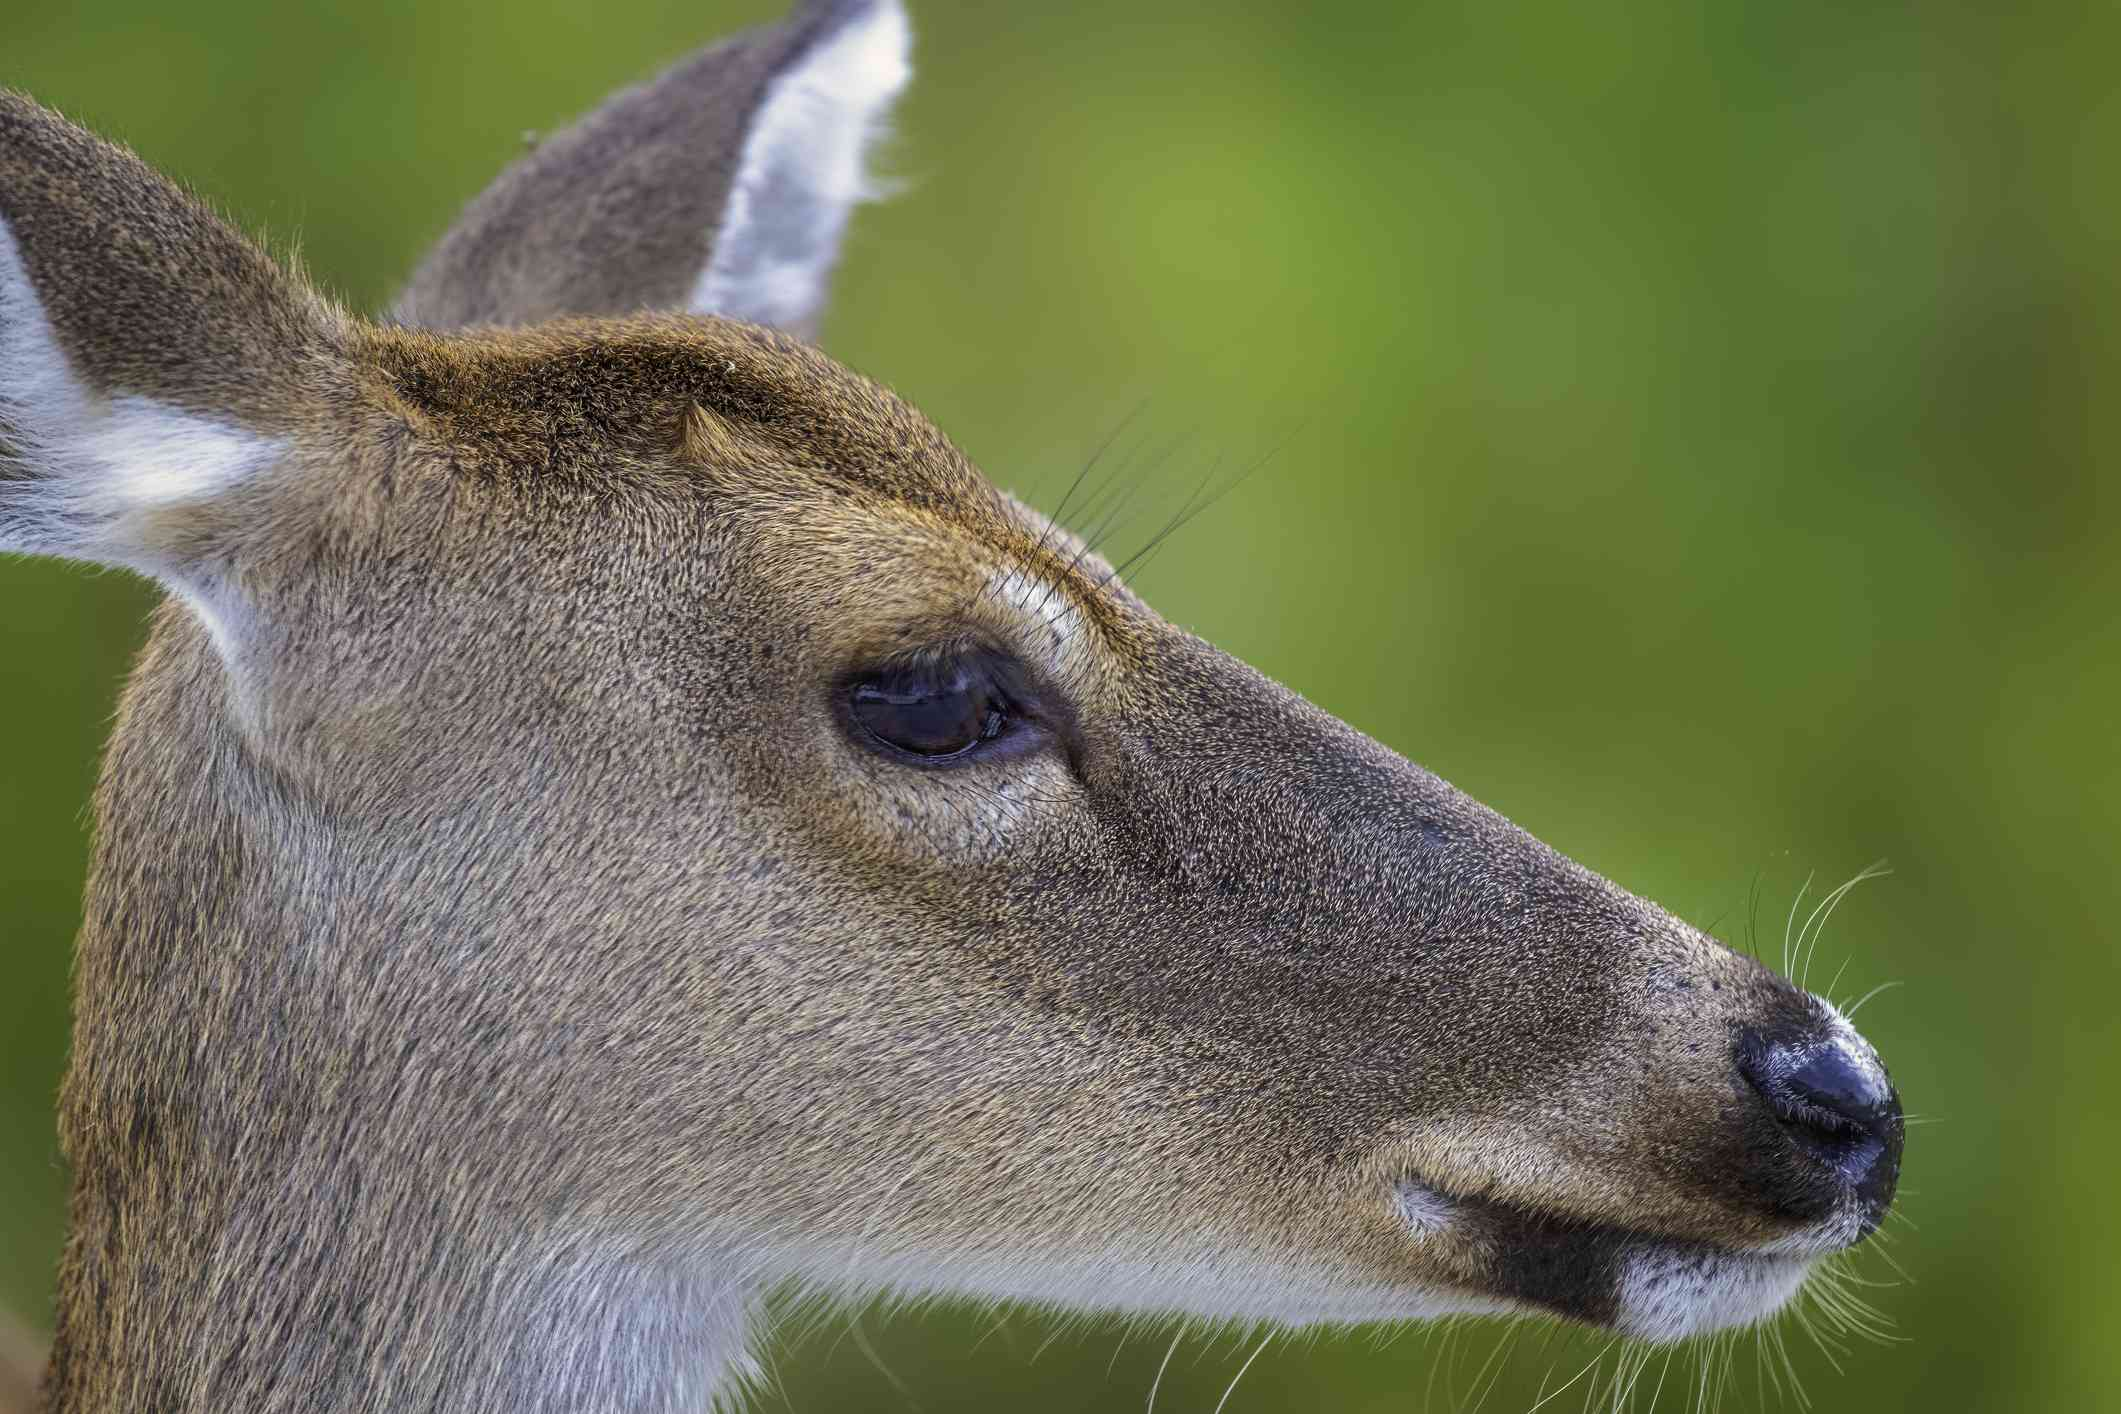 Close up head shot of doe/deer